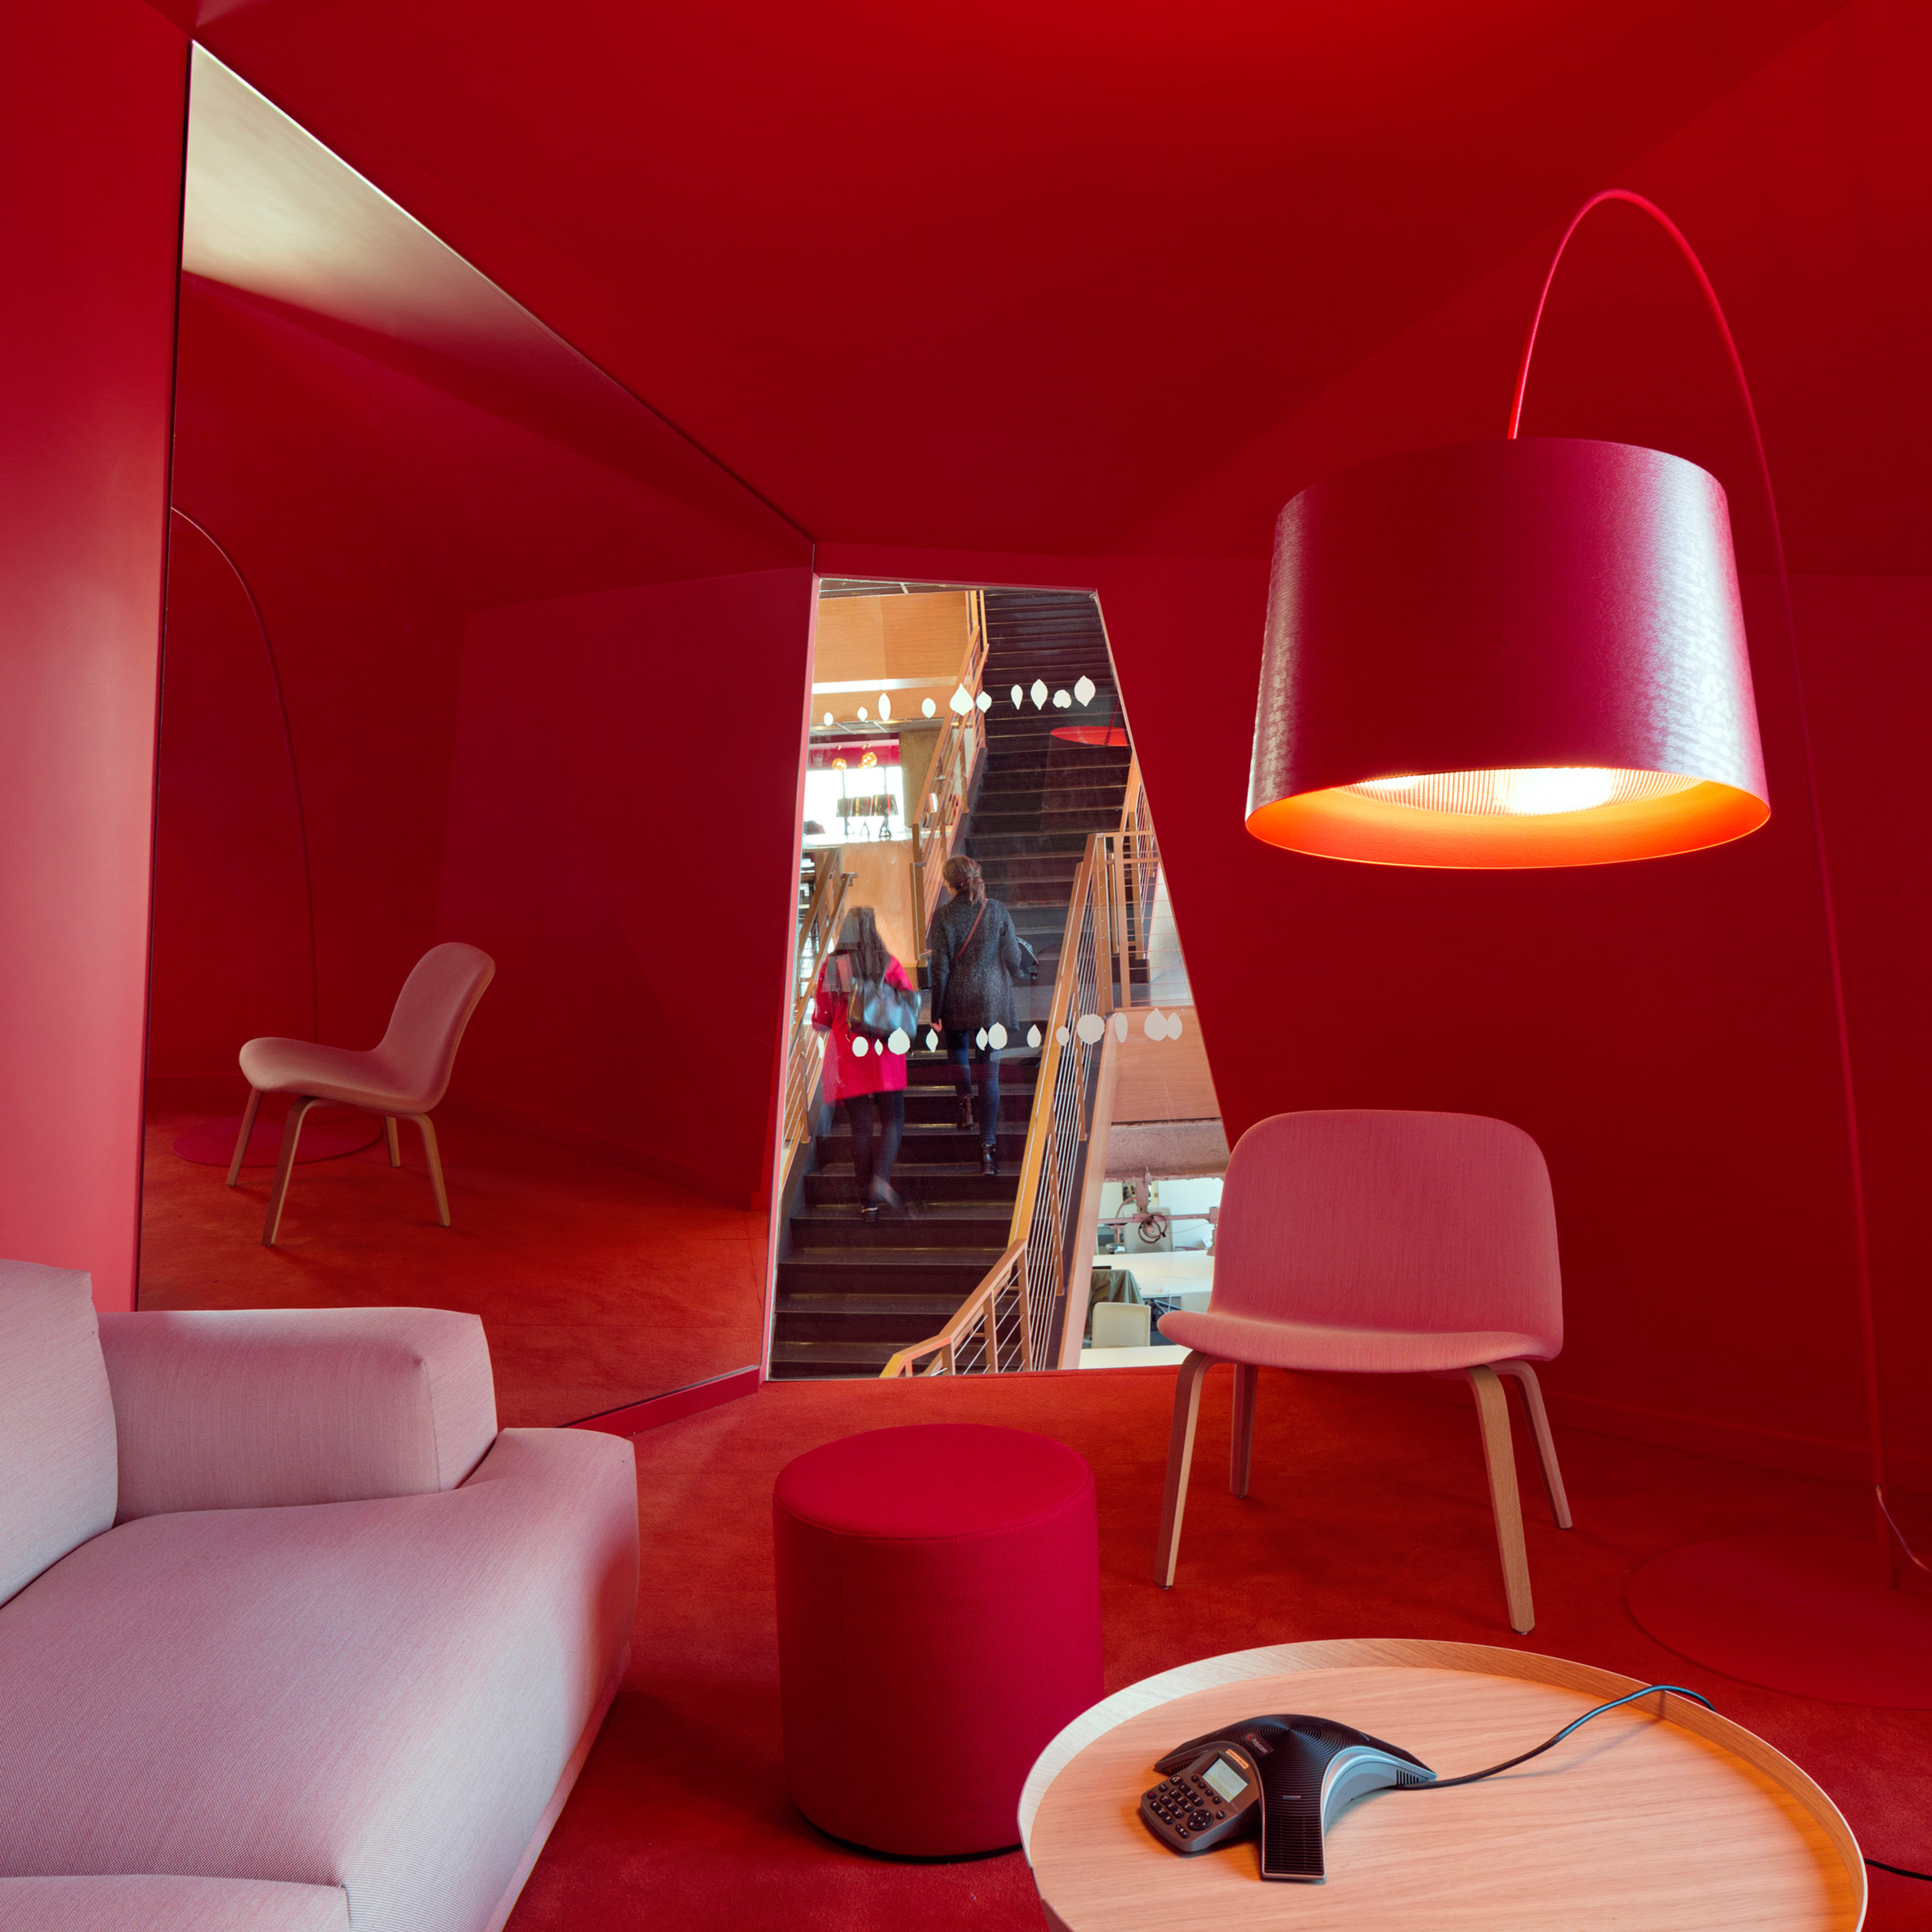 clive wilkinson architecture and interior design dezeen